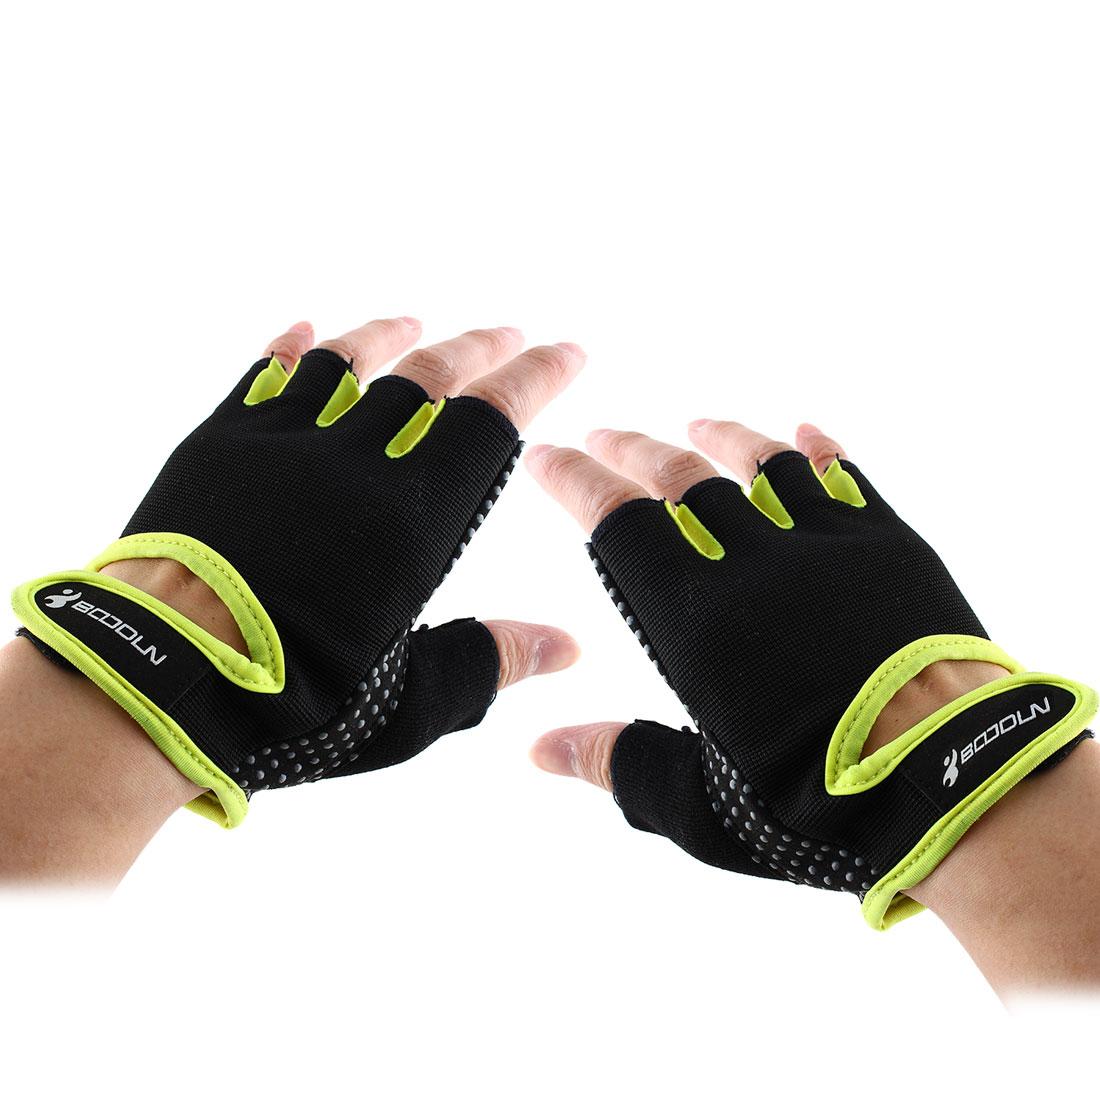 BOODUN Authorized Adult Unisex Spandex Adjustable Sports Training Workout Mittens Fitness Gloves Fluorescent Yellow XL Pair